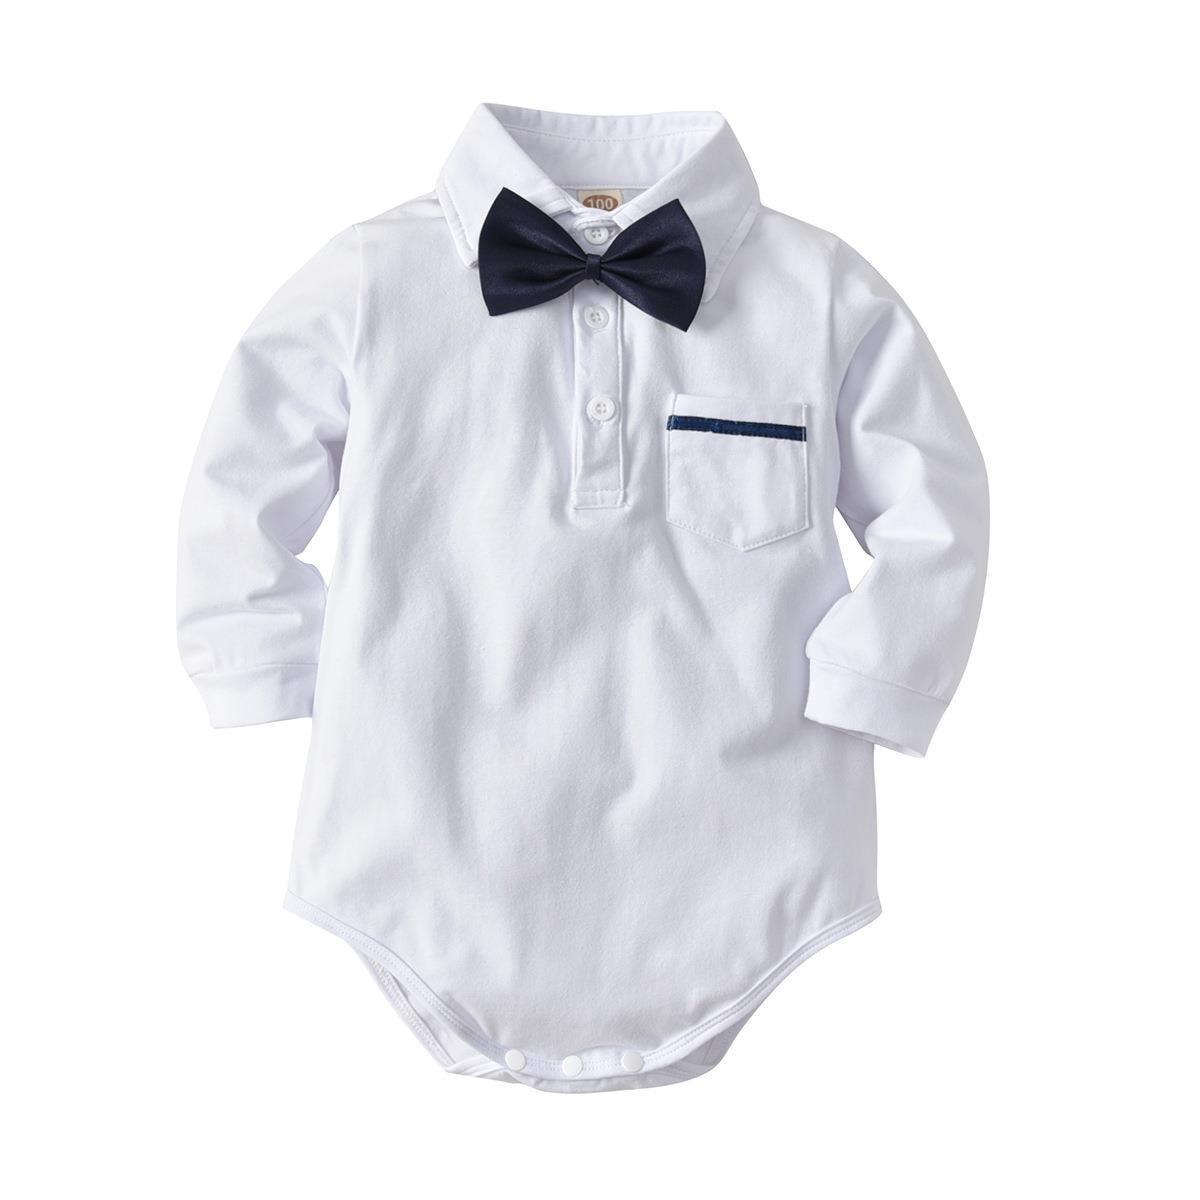 White Bodysuit Baby Suit Boy Clothes Modern Design Creative Baby Suit Combo Neonata Abbigliamento Clothes Baby Set BD50YE